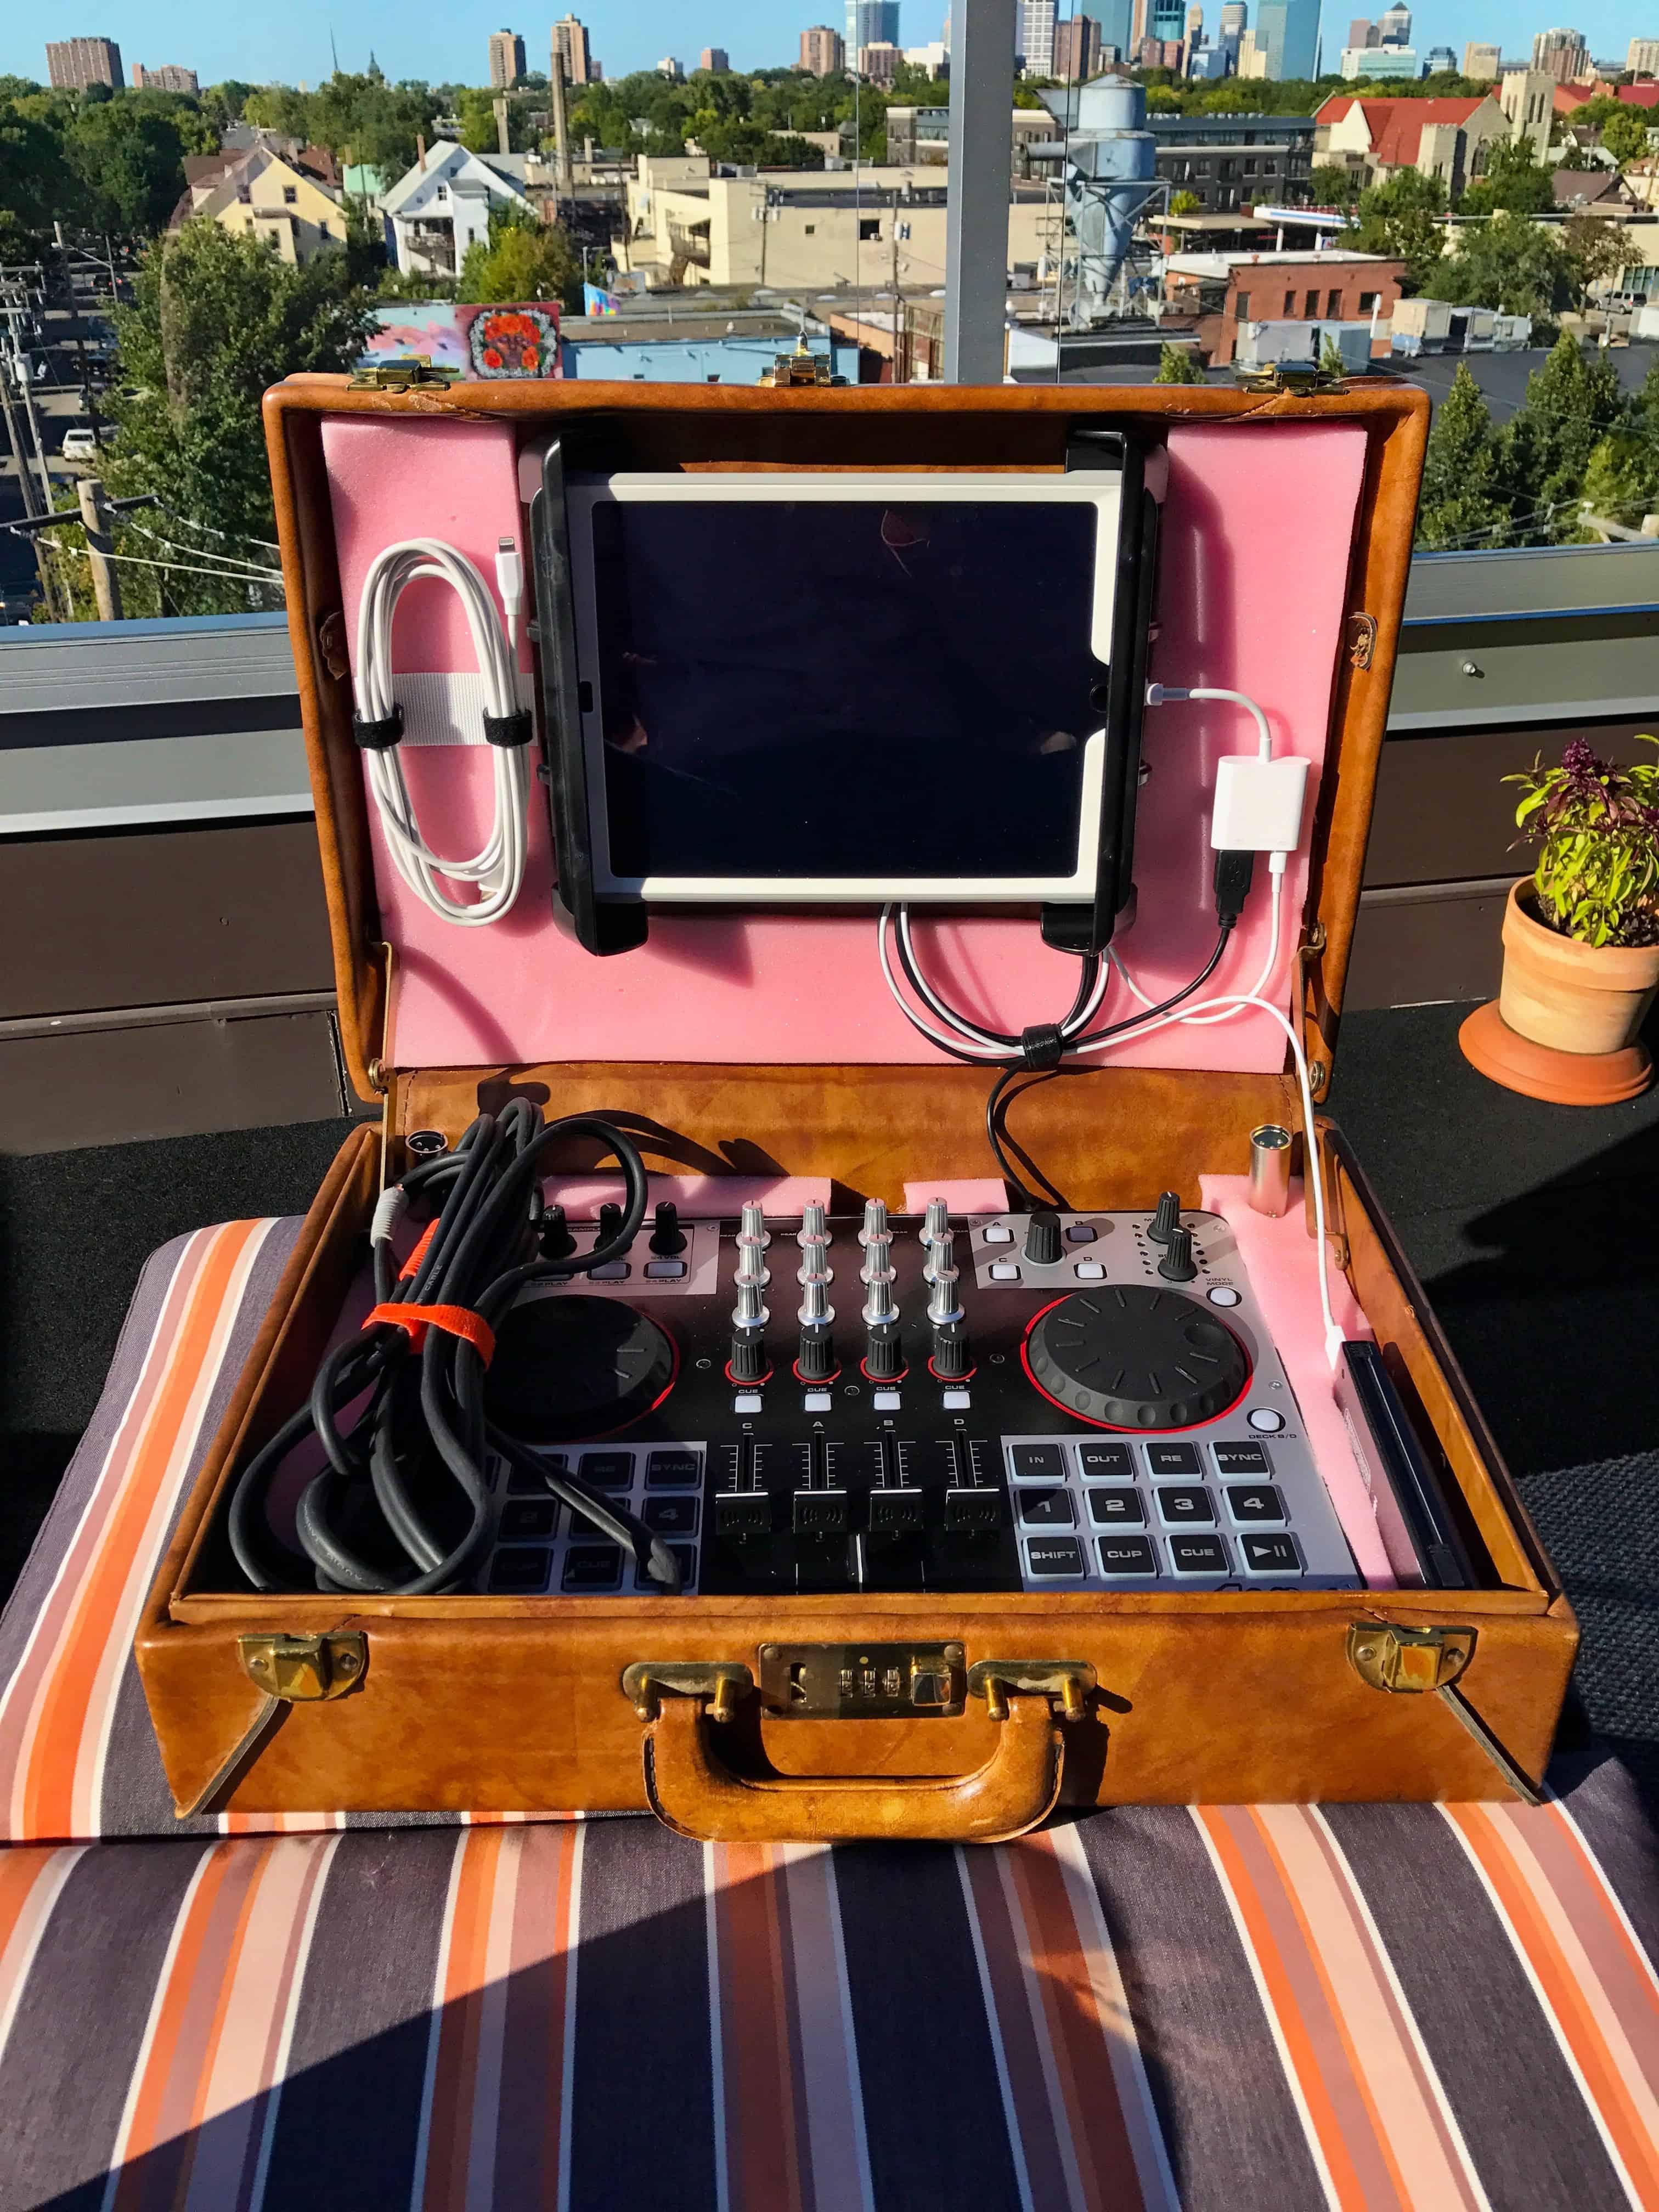 Briefcase open